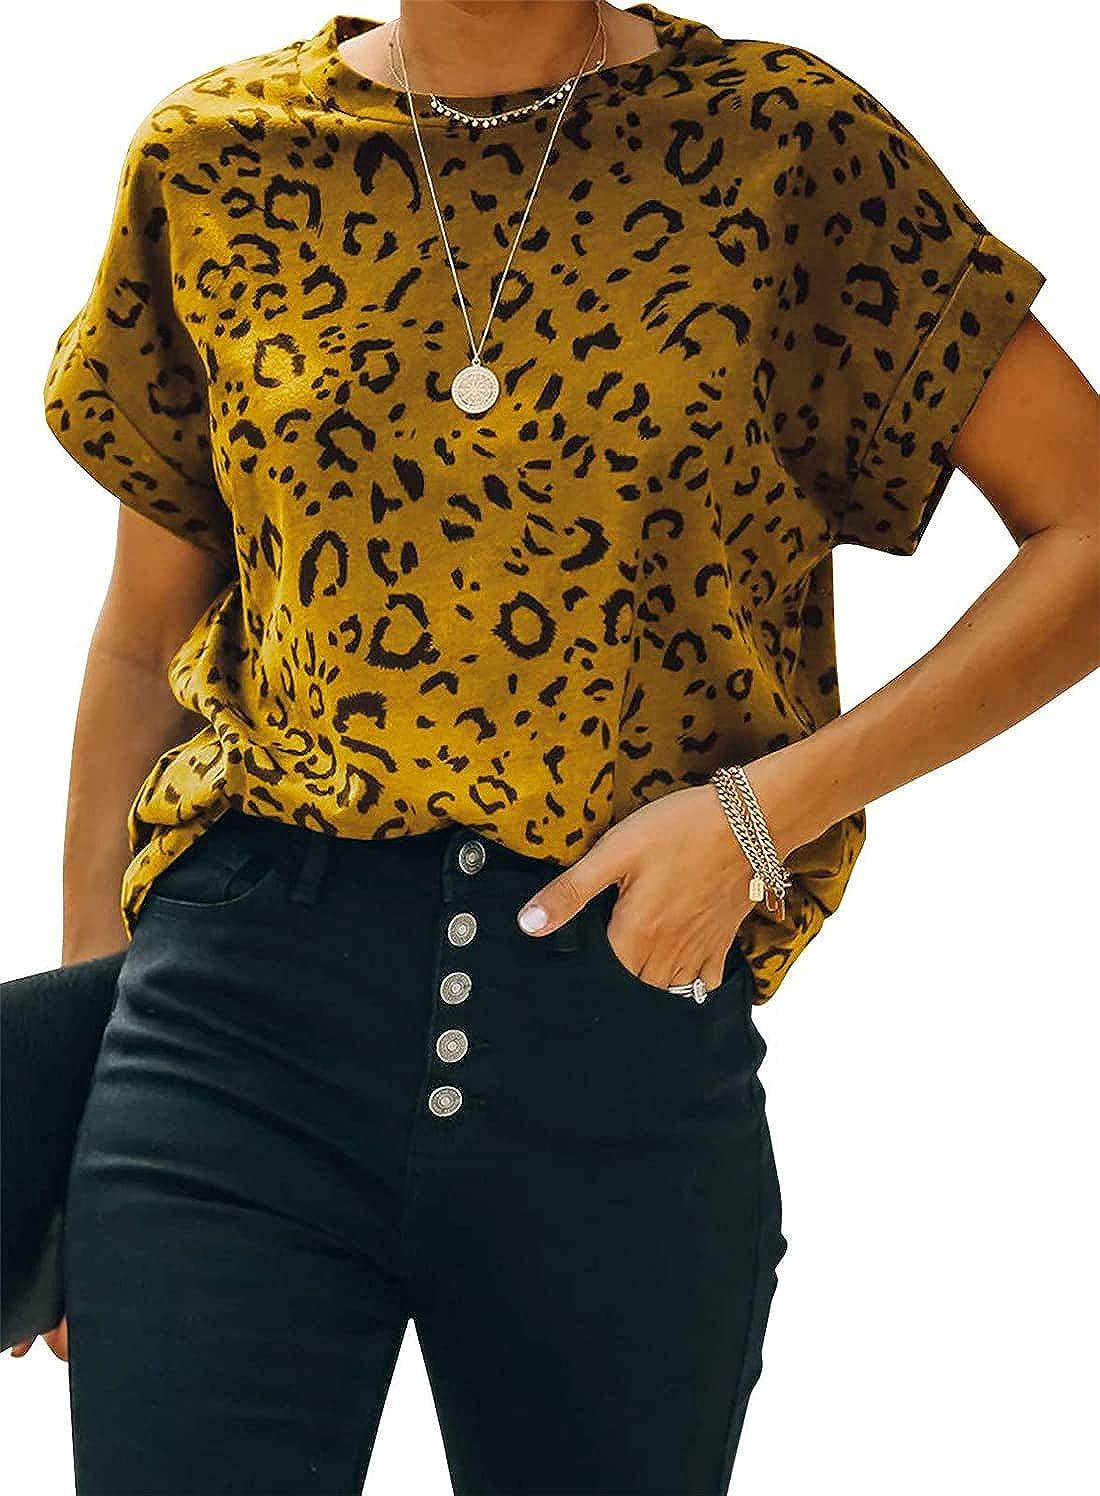 FRMUIC Women's Summer Short Sleeve Printed Round Neck T Shirt Basic Blouse Loose Fashion Top